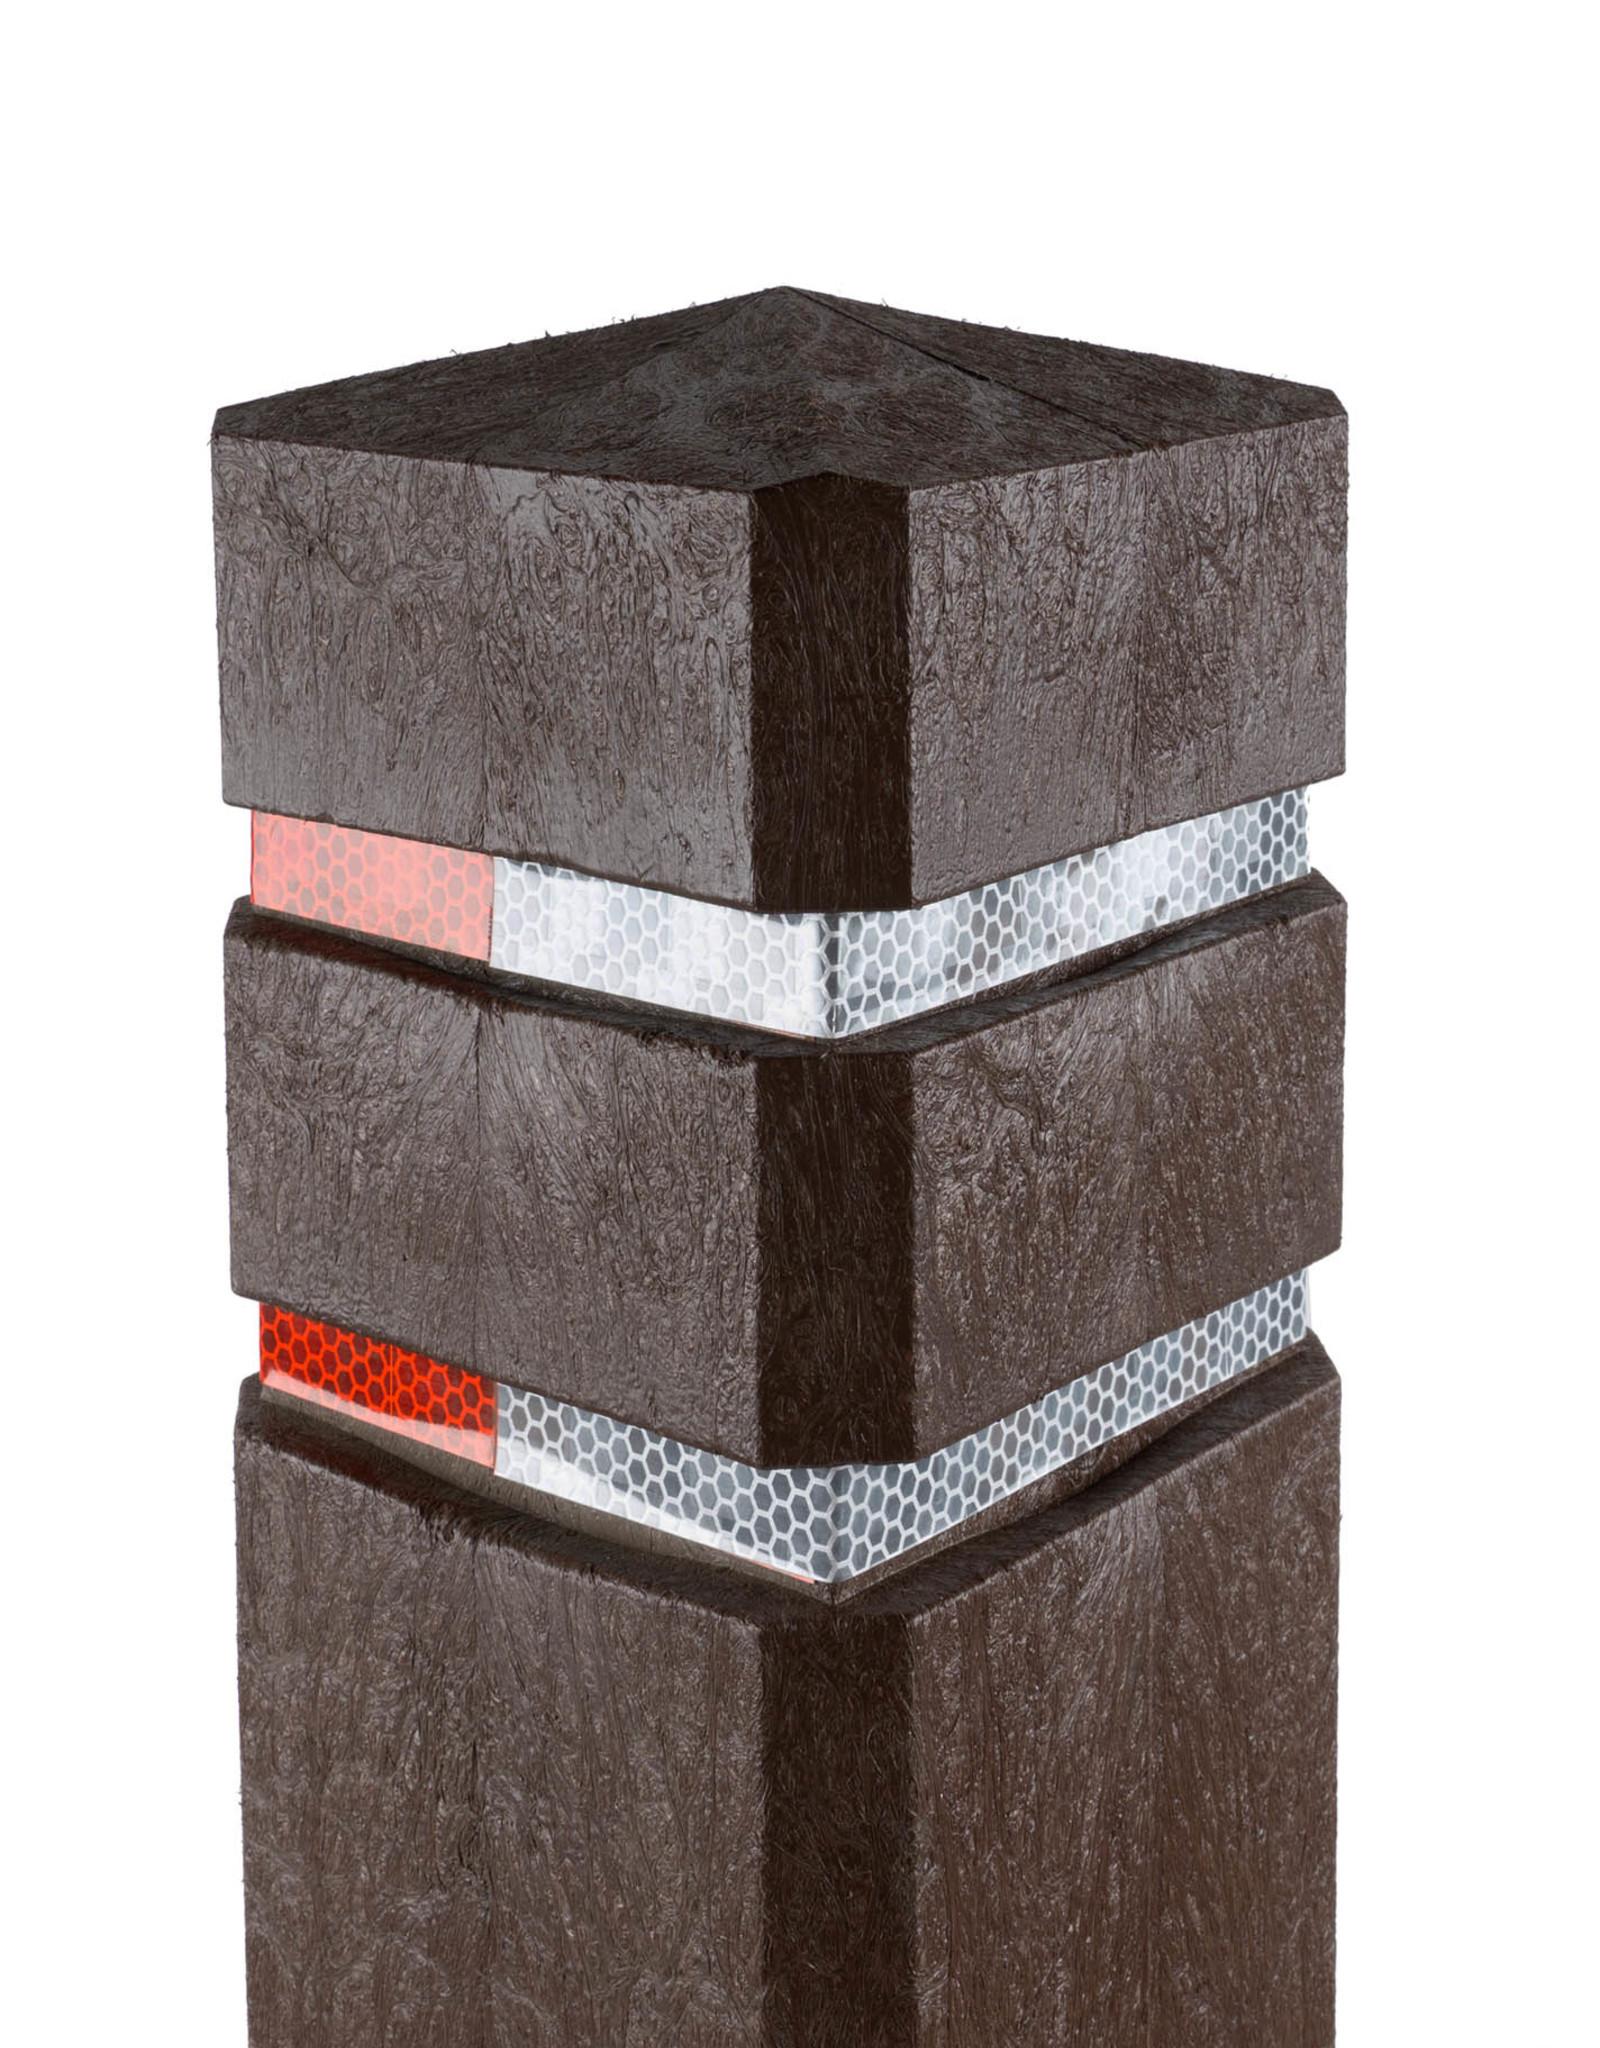 Ri-Traffic   Diamantkoppaal Kunststof Bruin / Anti Parkeerpaal / Trottoirpaal / Reflectorpaal